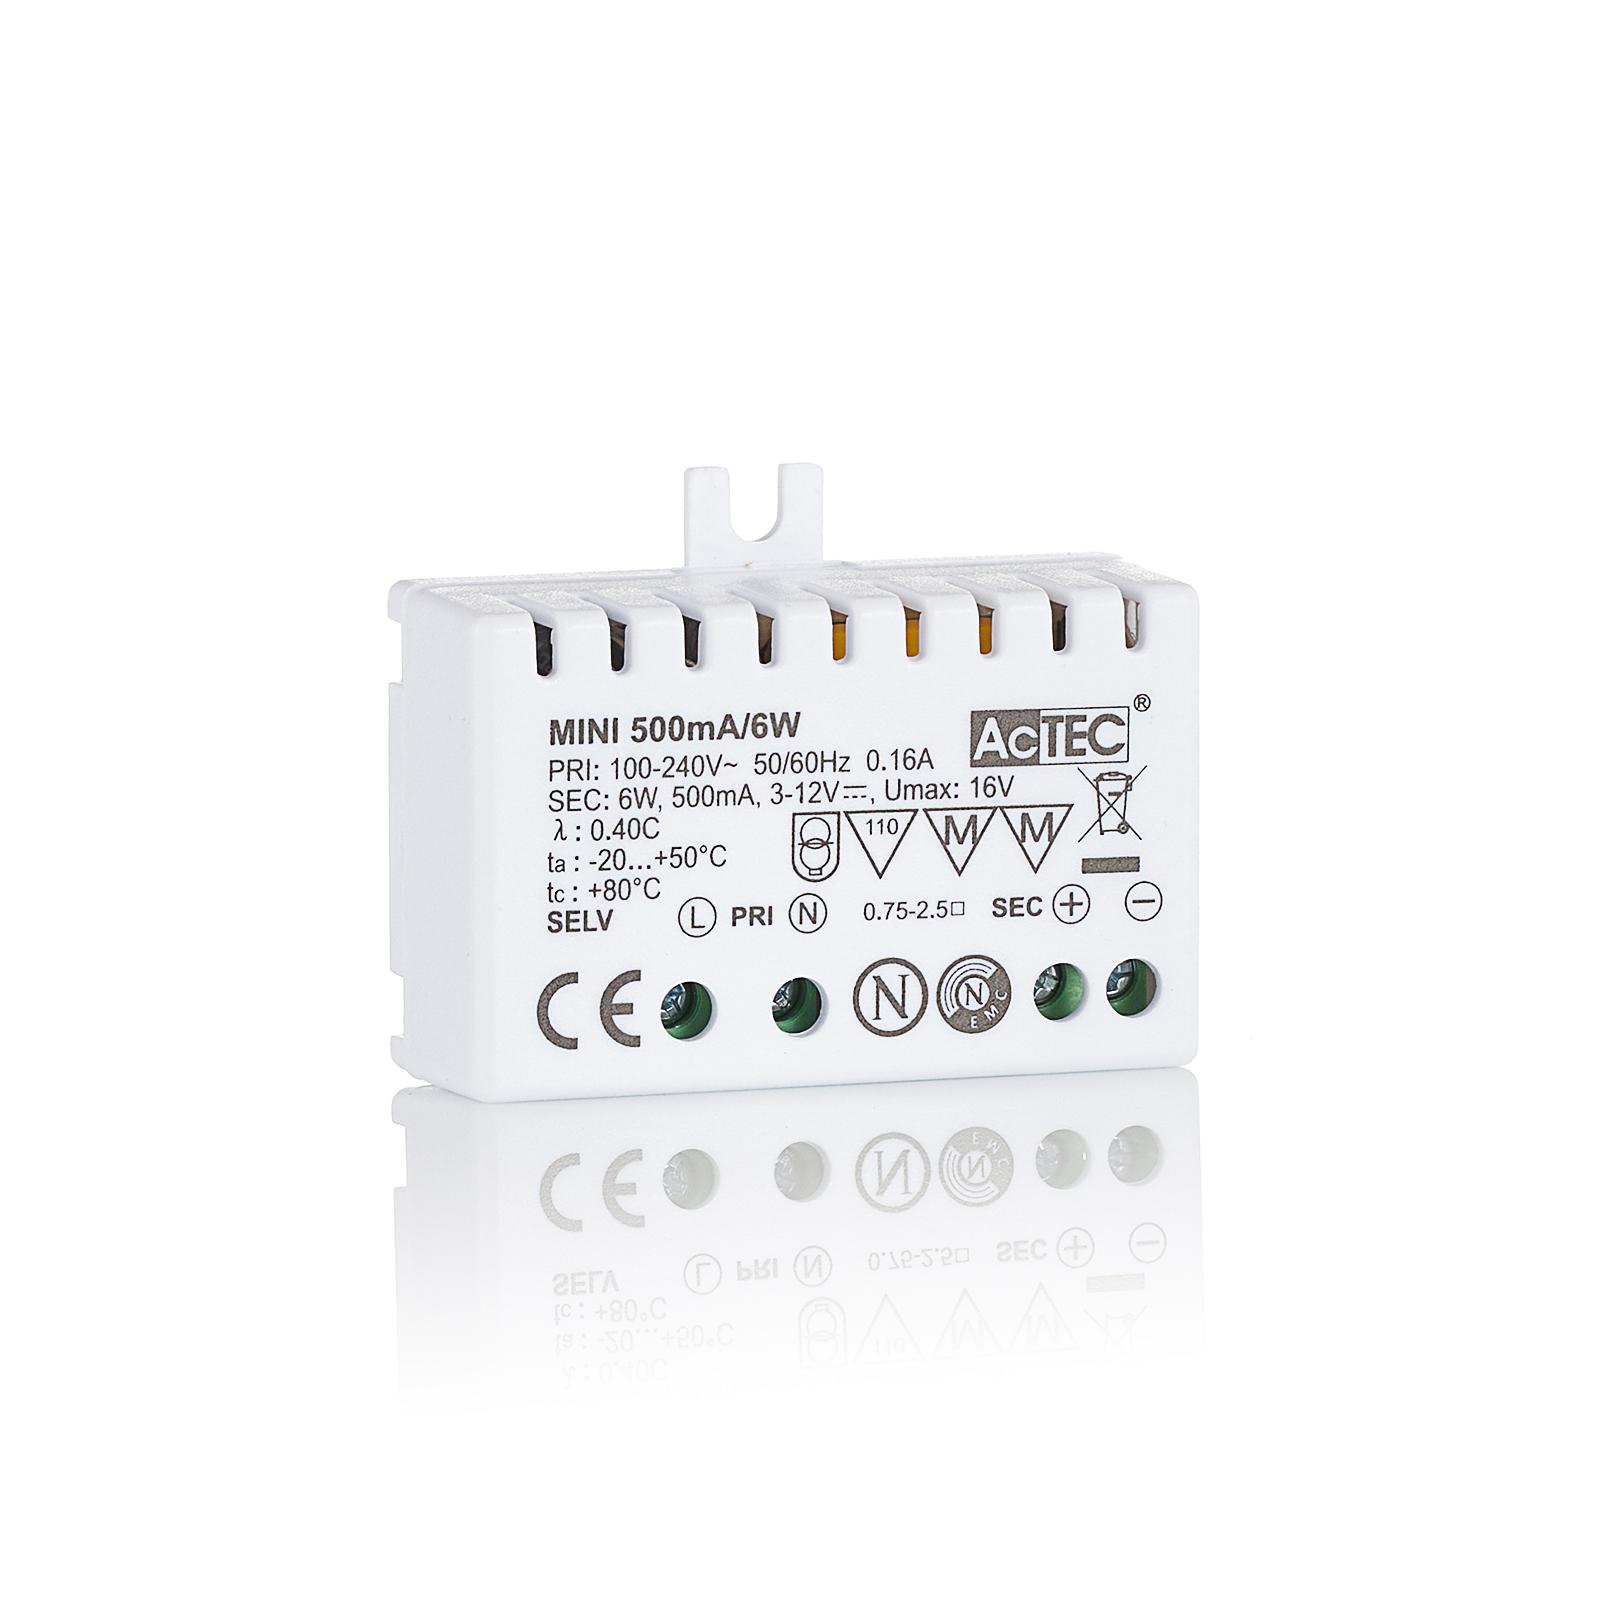 AcTEC Mini LED driver CC 500mA, 6W, IP20